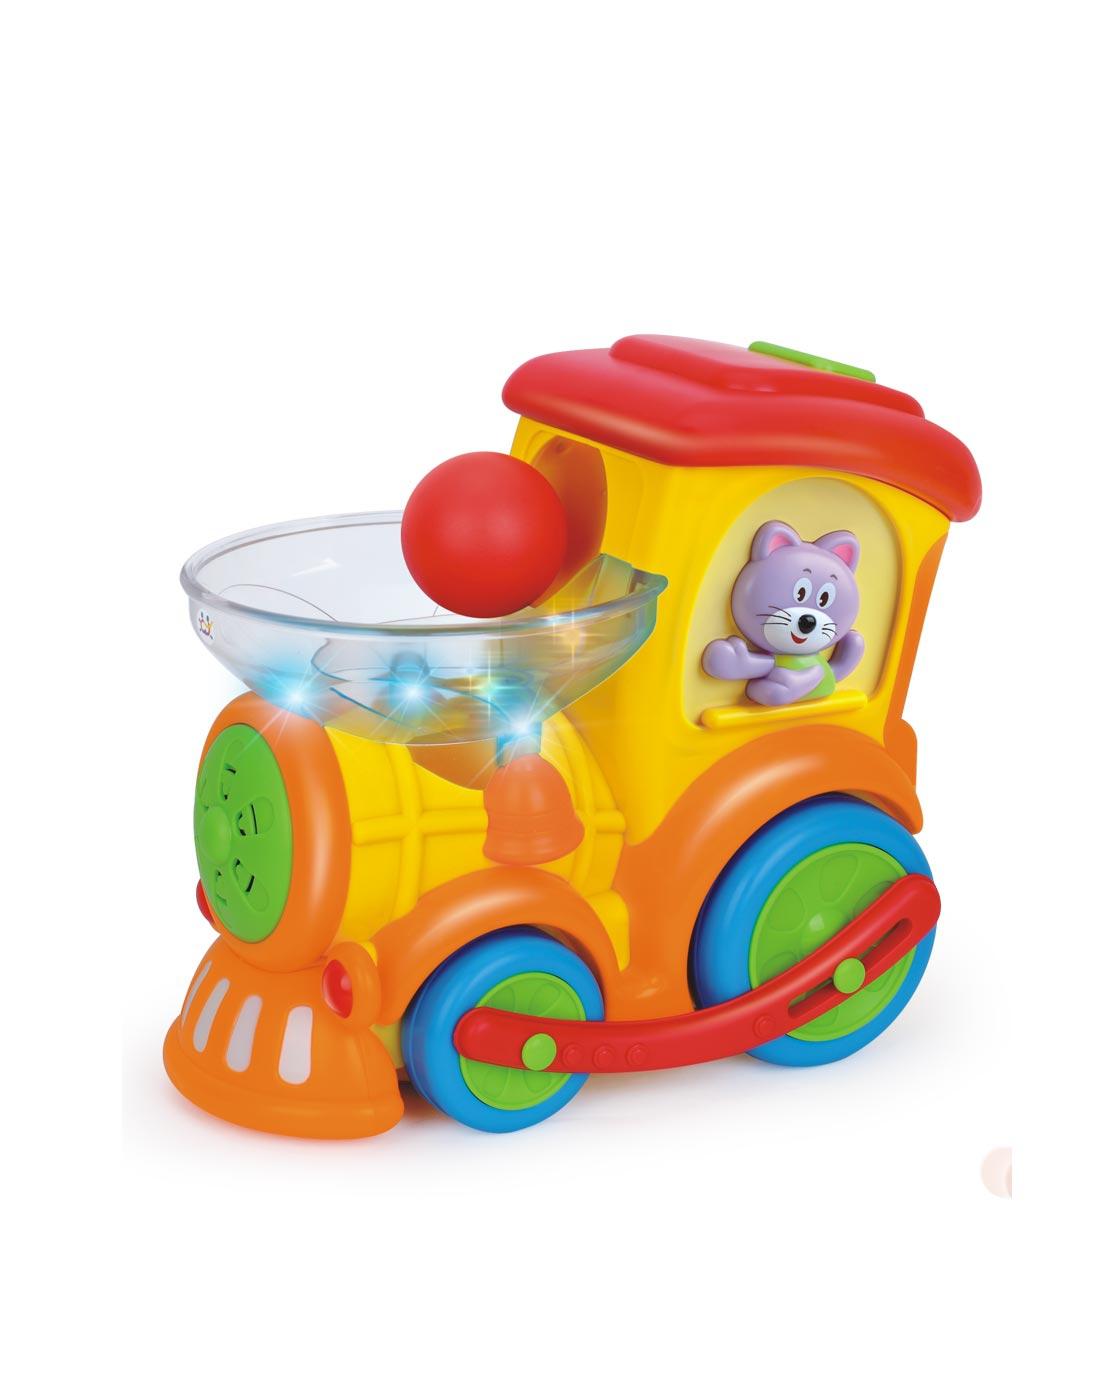 toys专场嘟嘟小火车958